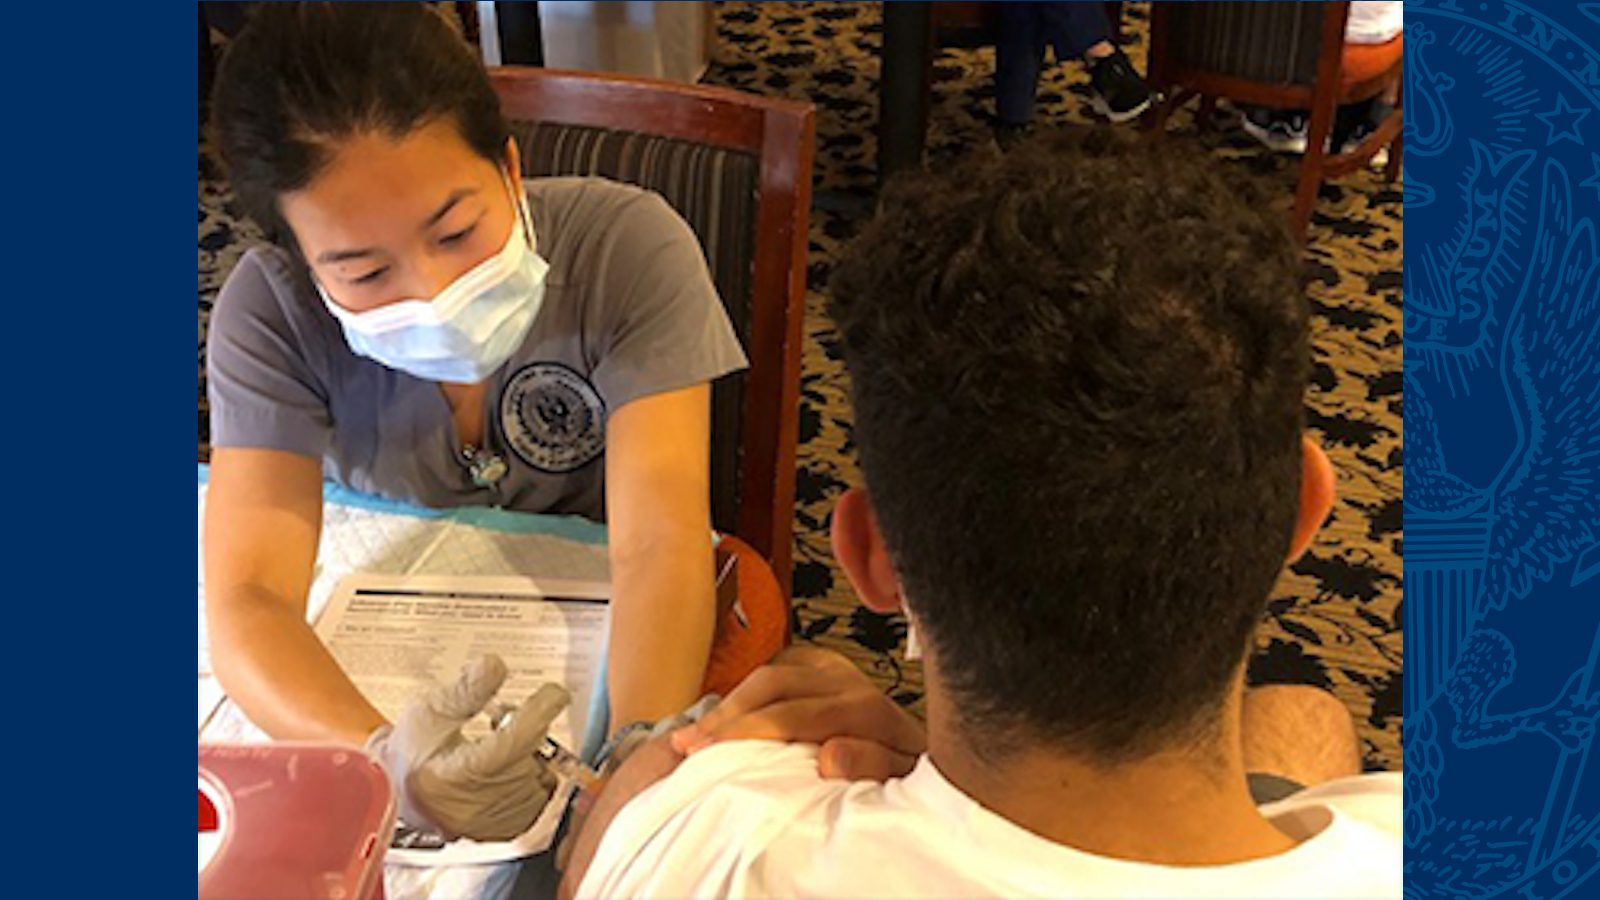 Nursing student wearing a mask gives a flu shot